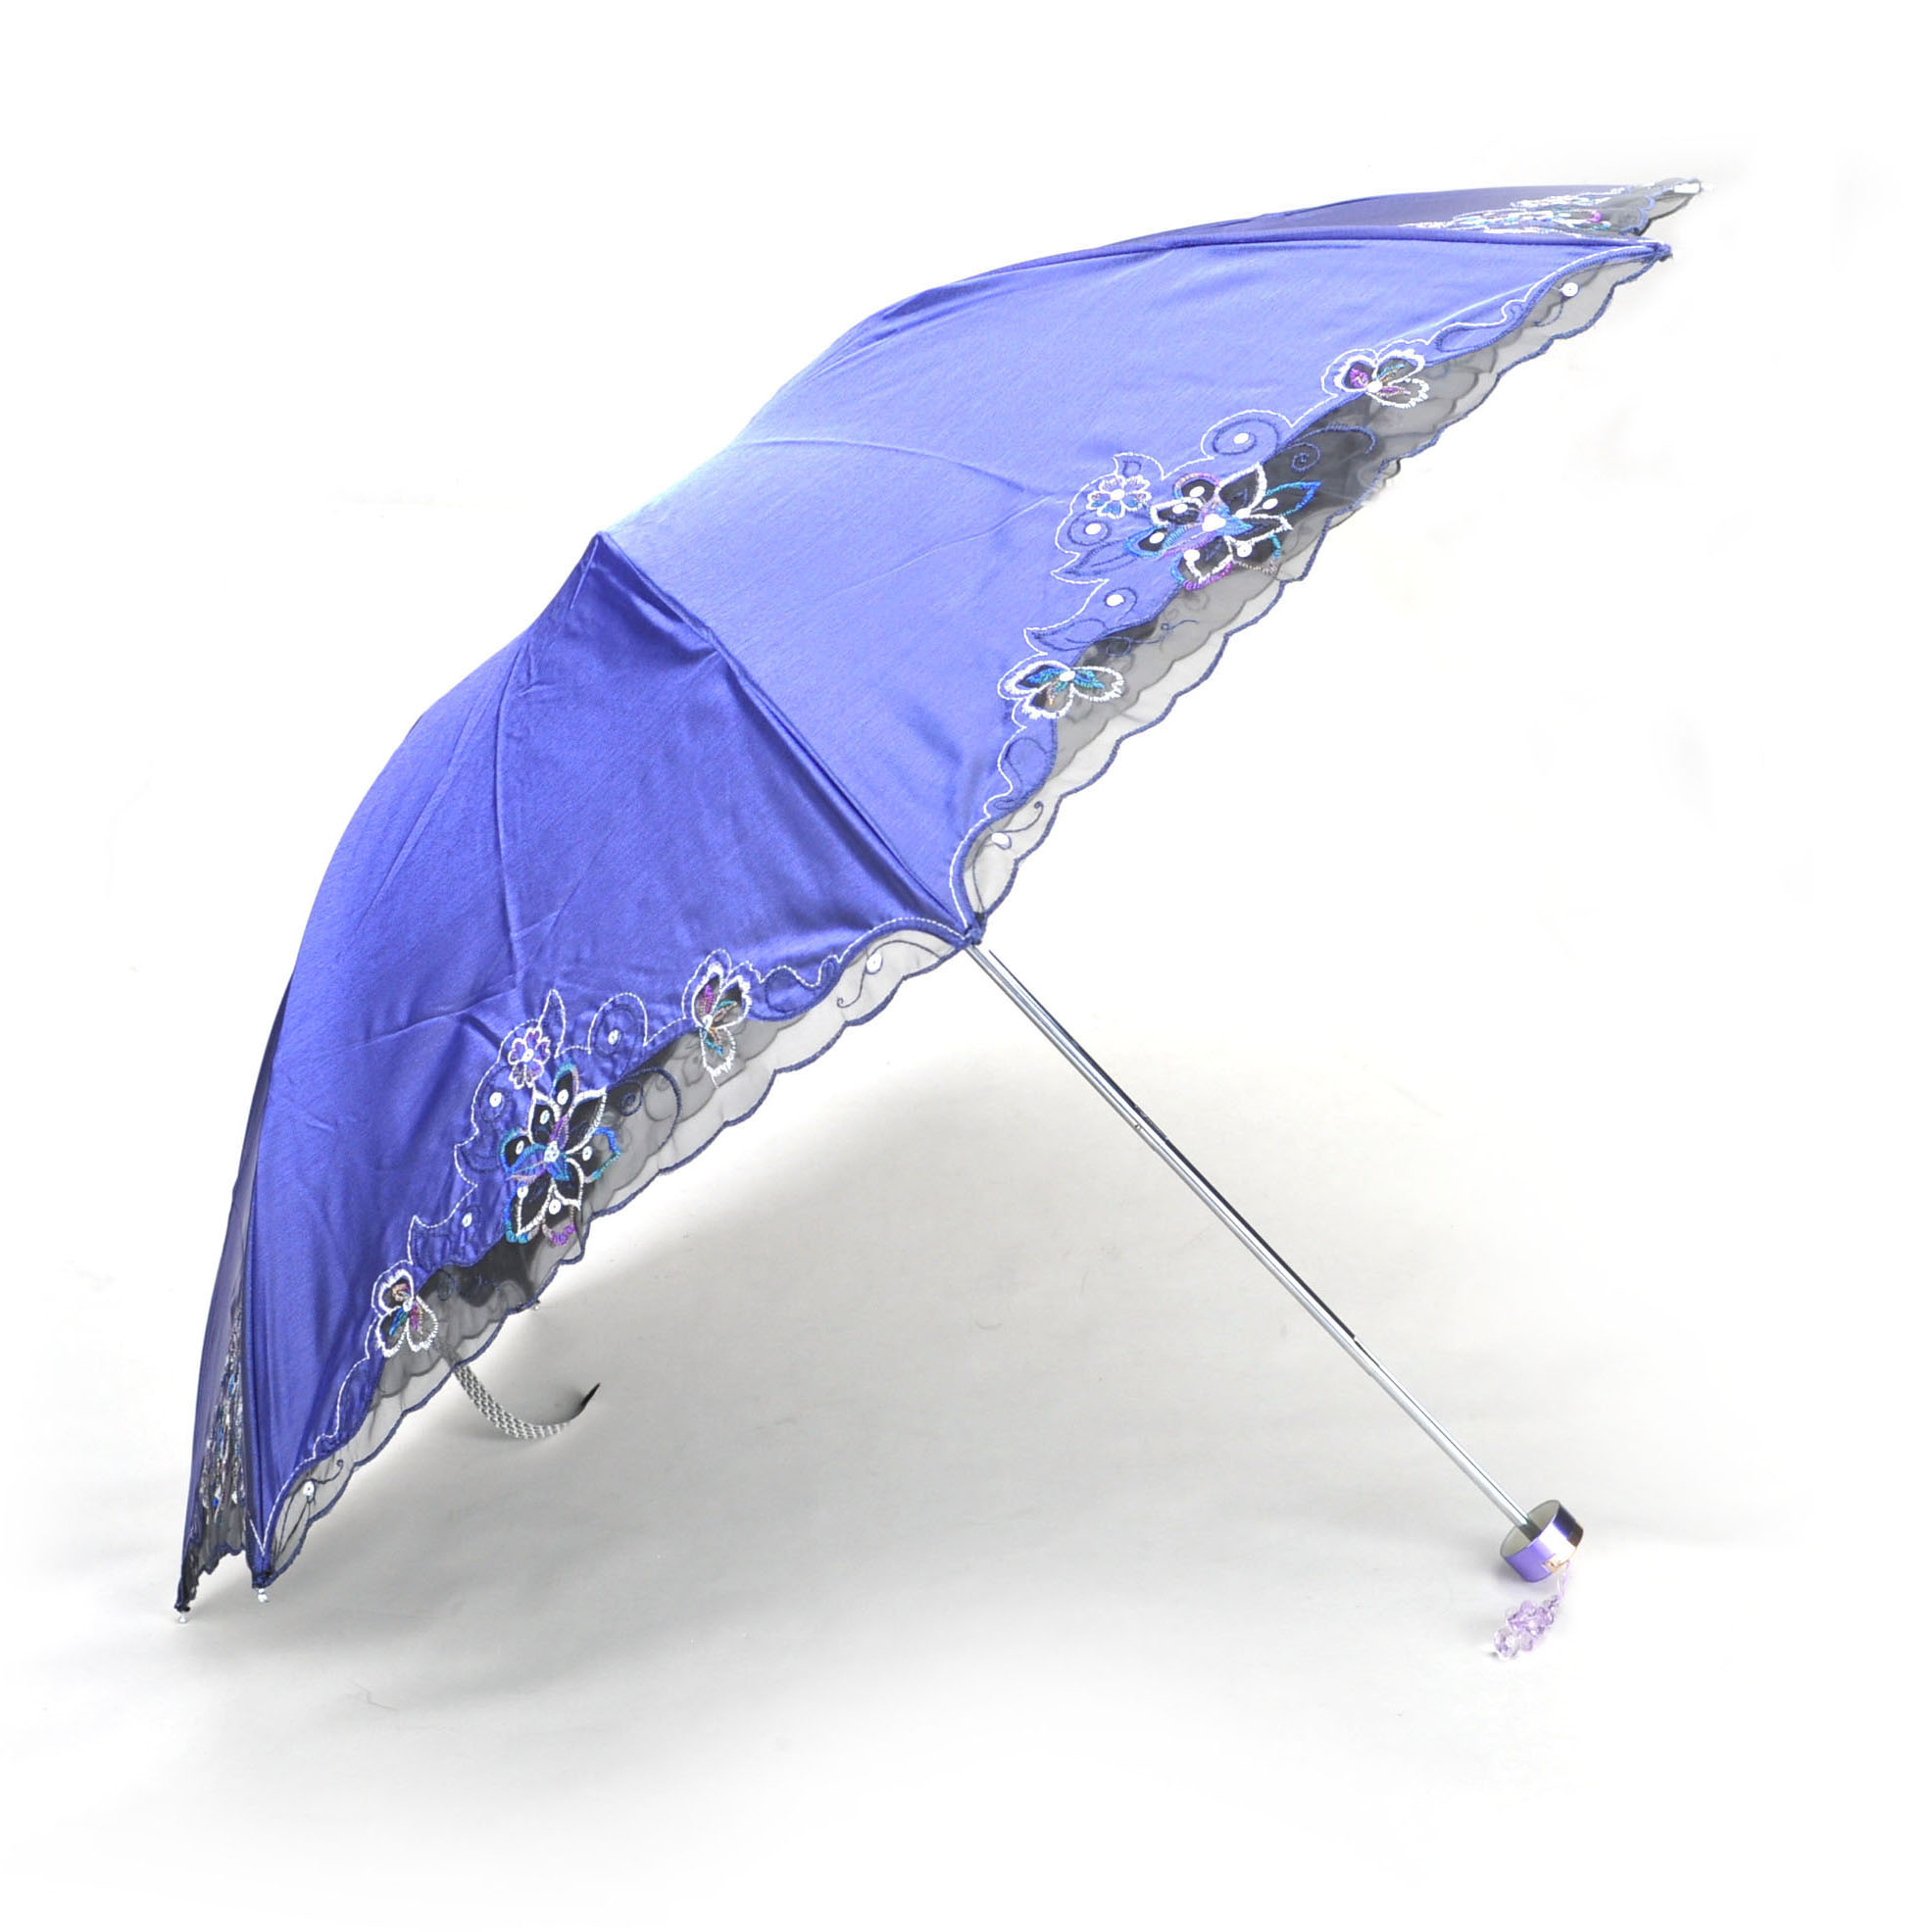 toptie sun shade anti uv umbrella uv protection folding